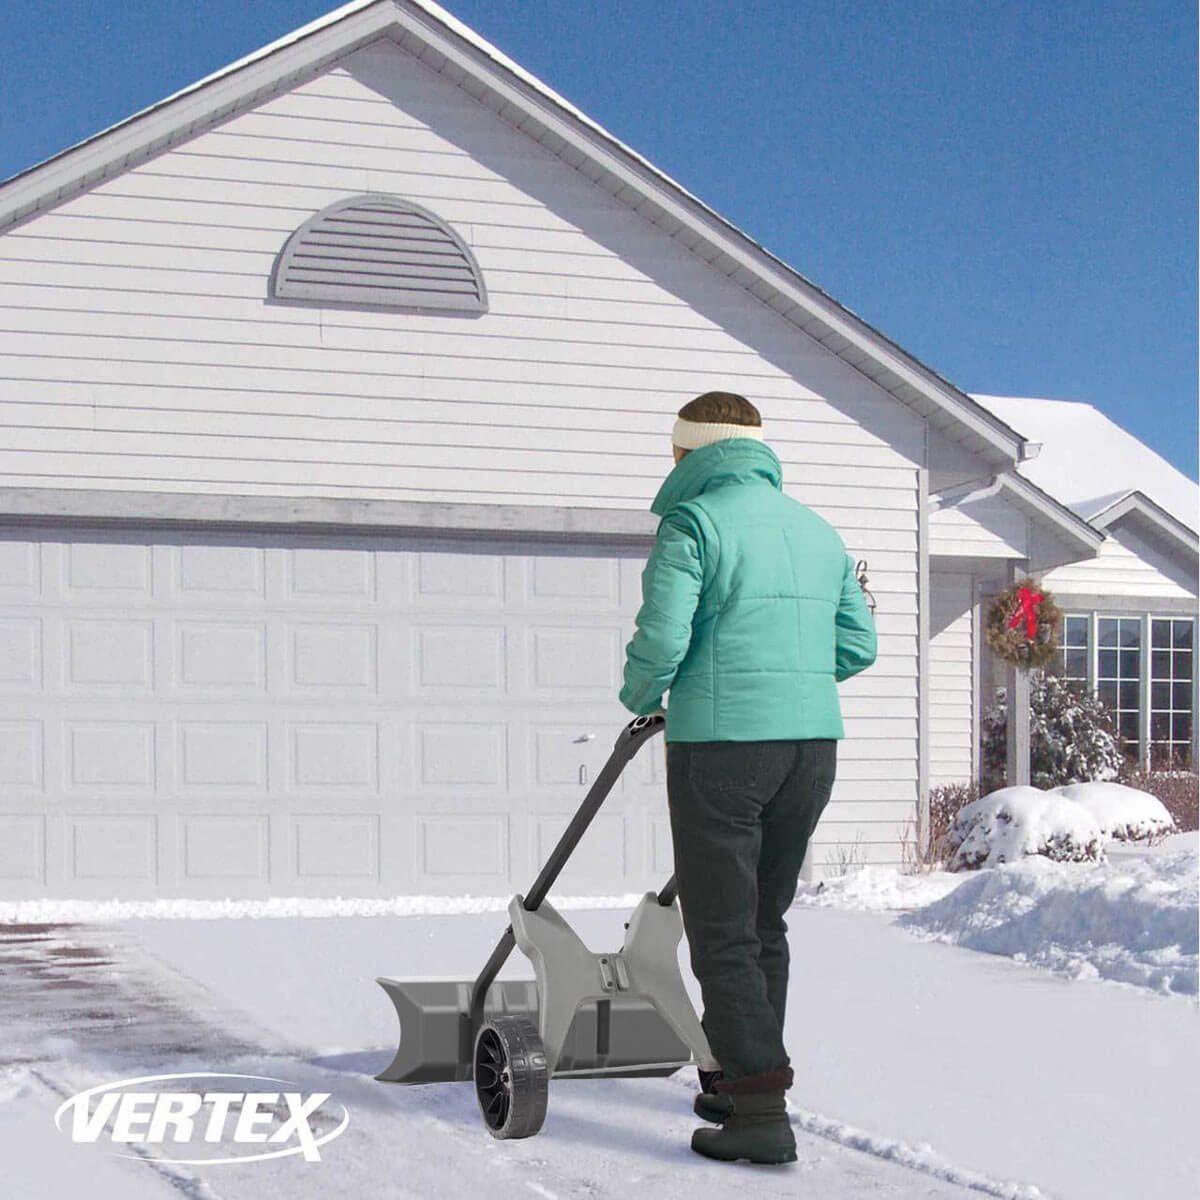 vertex snow pusher snow removal tool